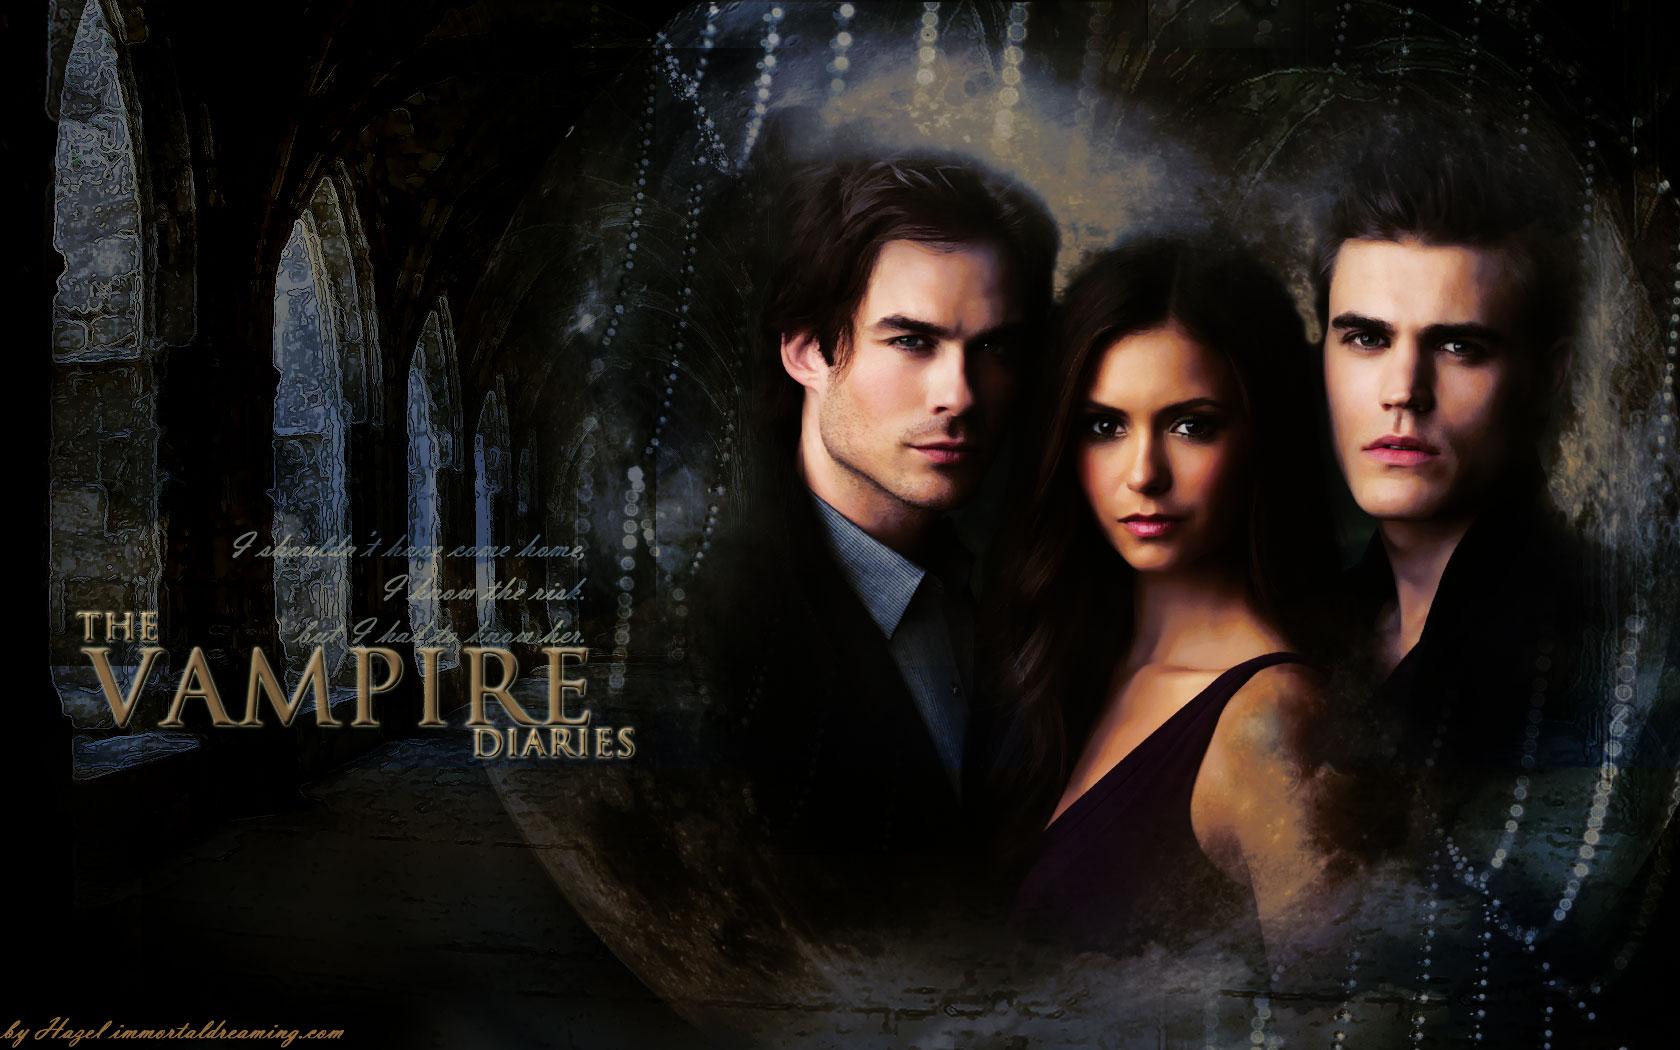 The Vampire Diaries TheVampireDiaries_by_hazelxxx